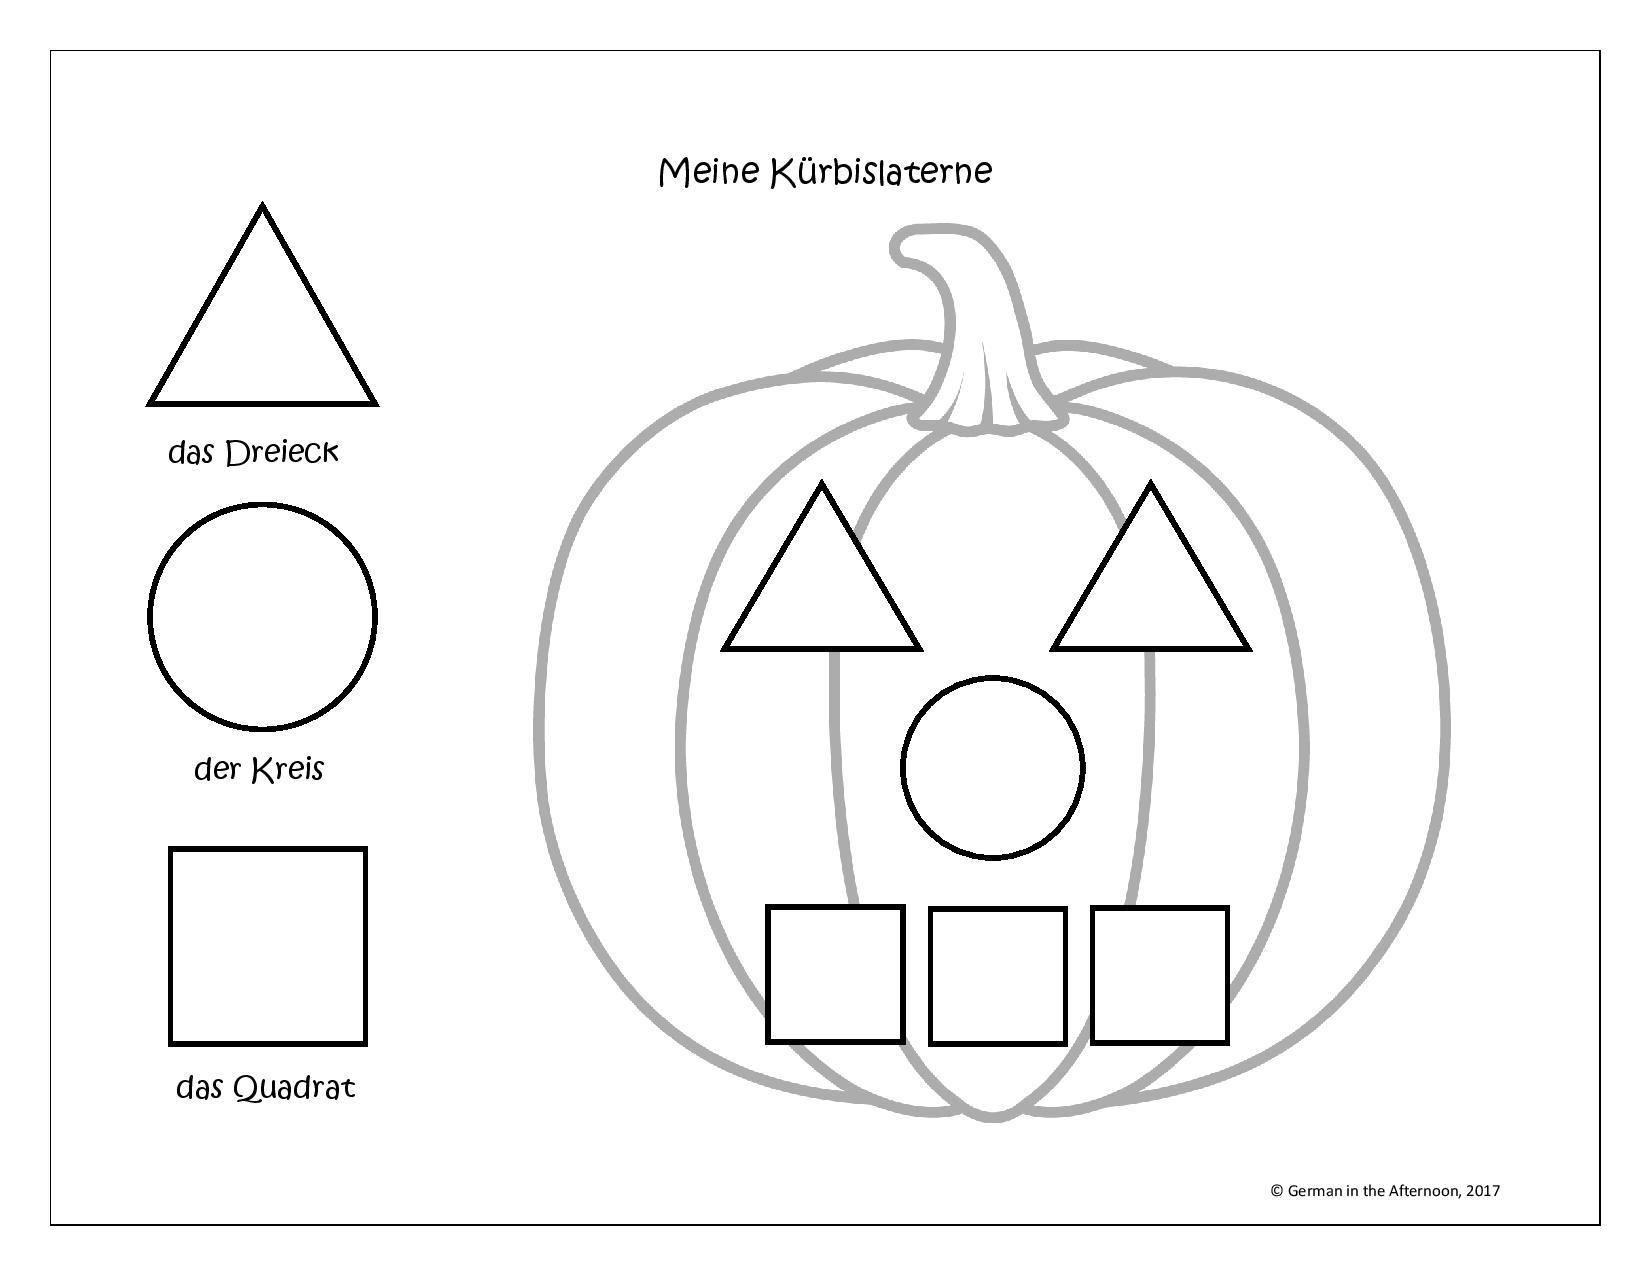 Meine Kürbislaterne mit Formen GitA-page-003